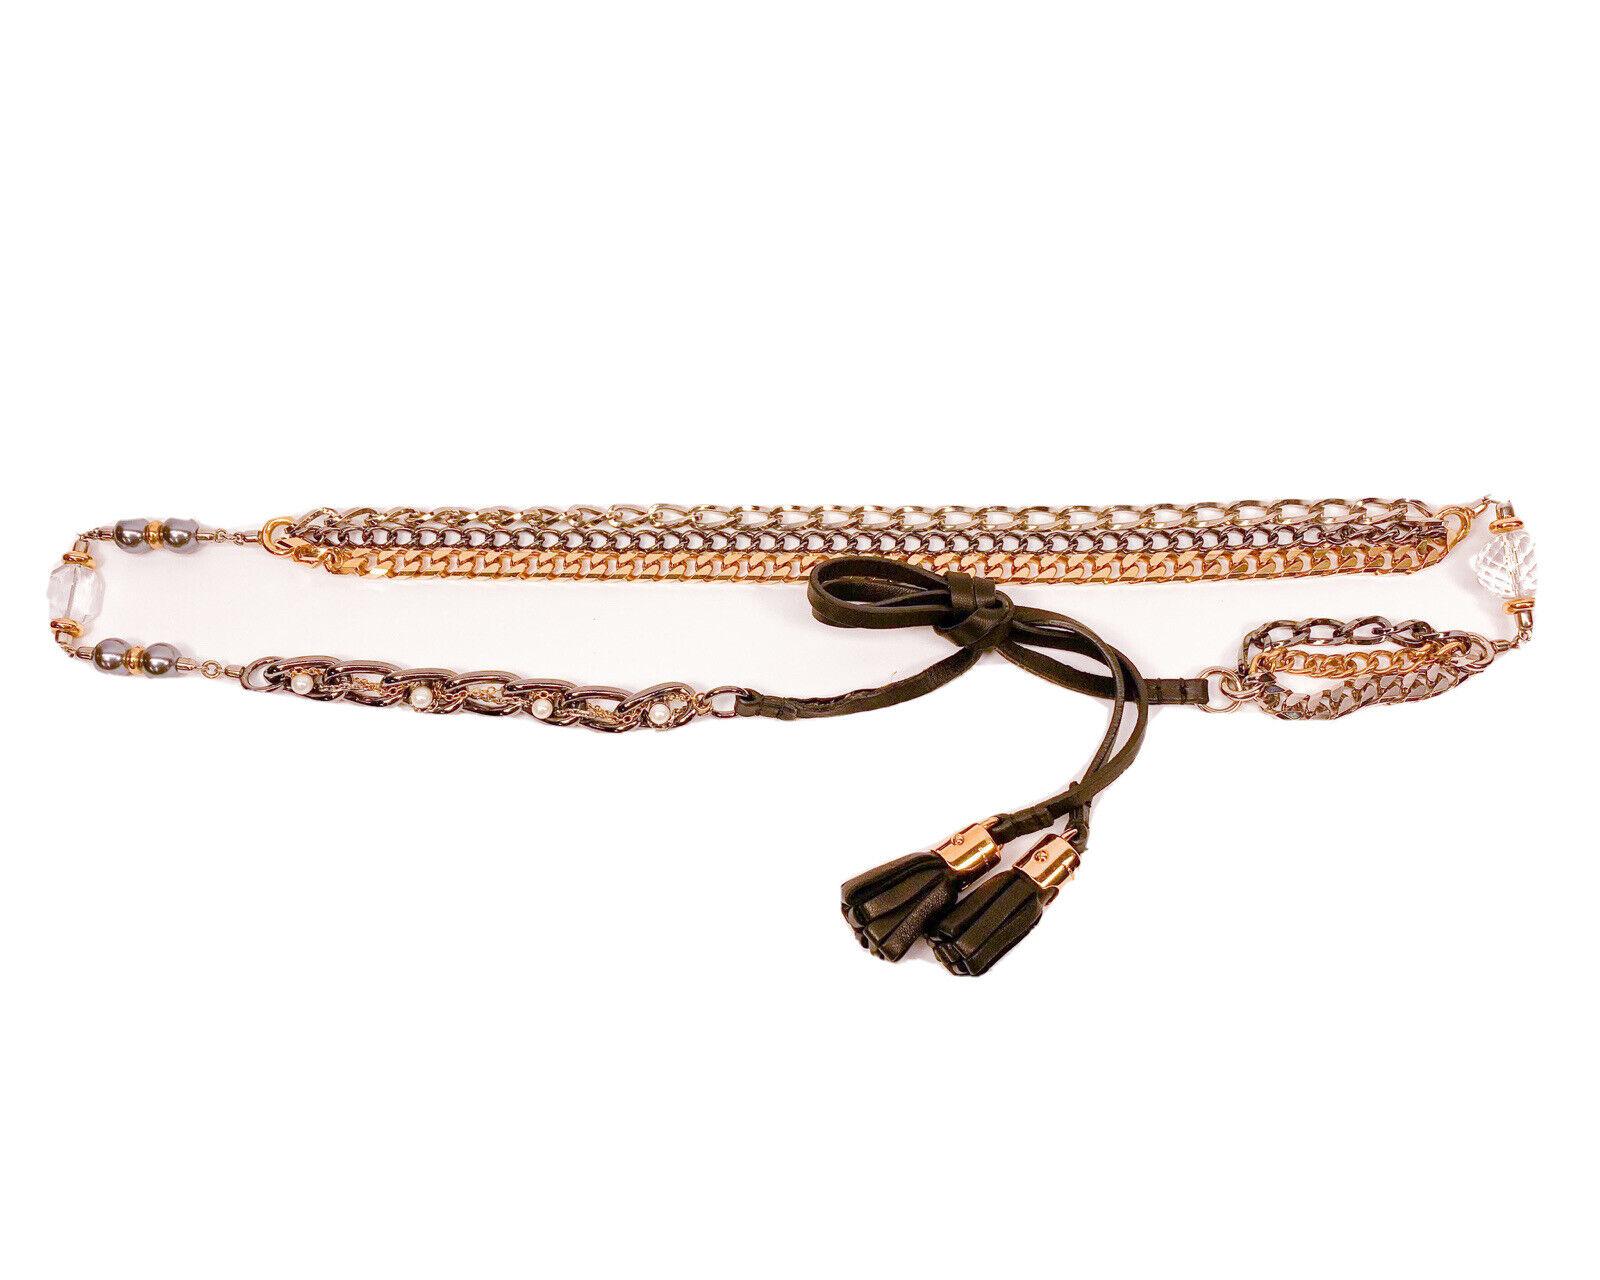 Dolce & Gabbana * pista Raro Bijoux Cadena Cristal Joyas so de cinturón de lazo